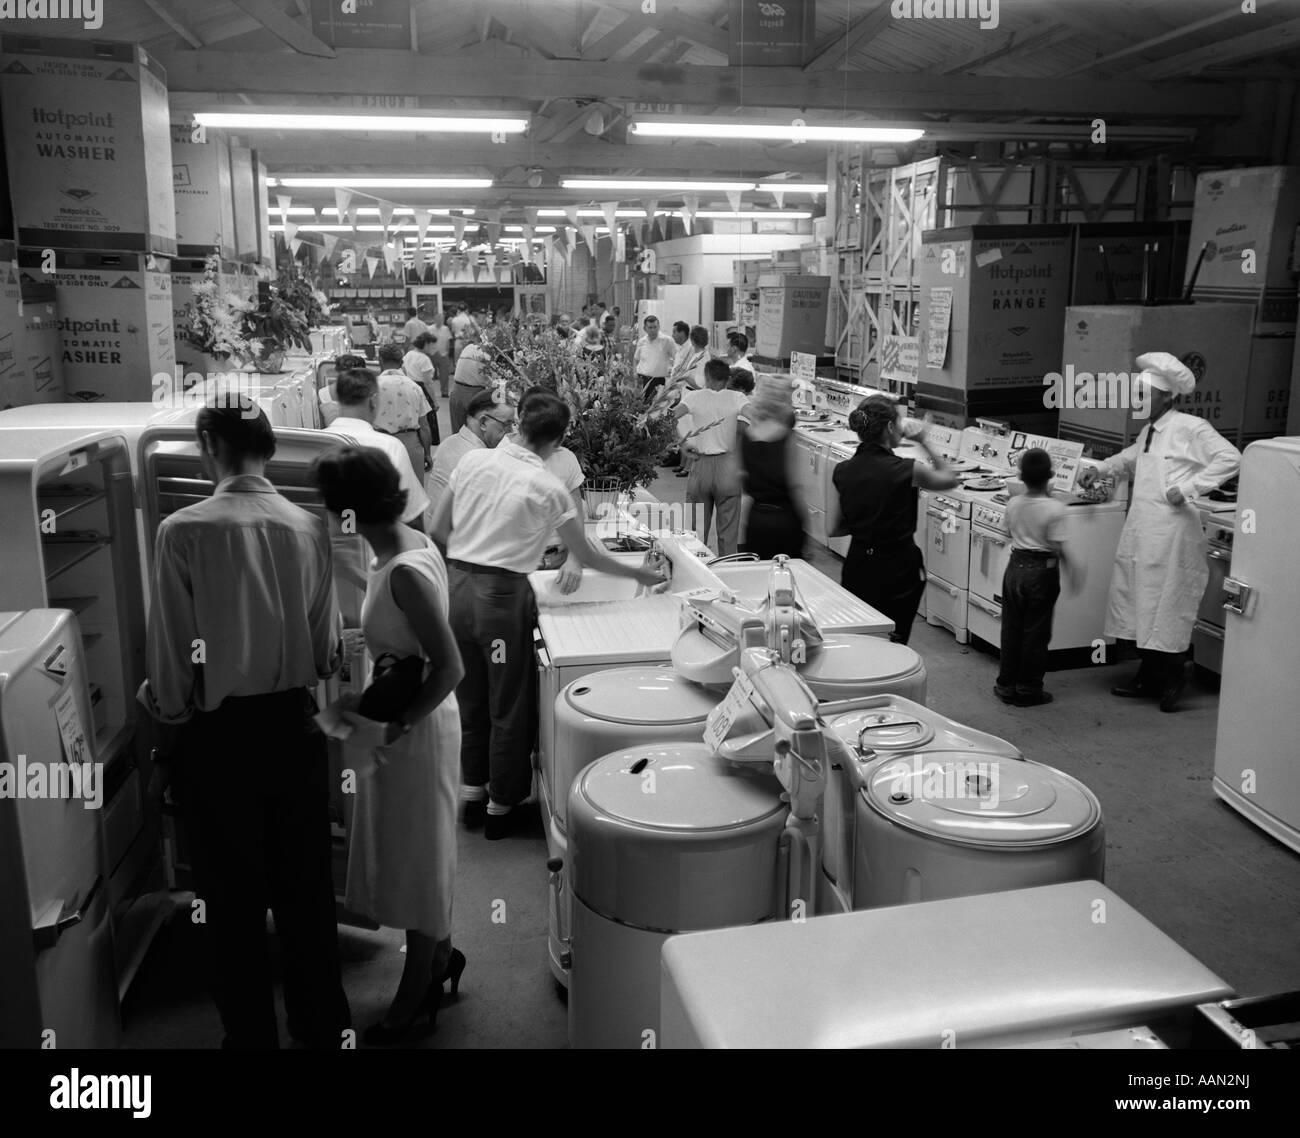 1950s APPLIANCE SHOWROOM - Stock Image